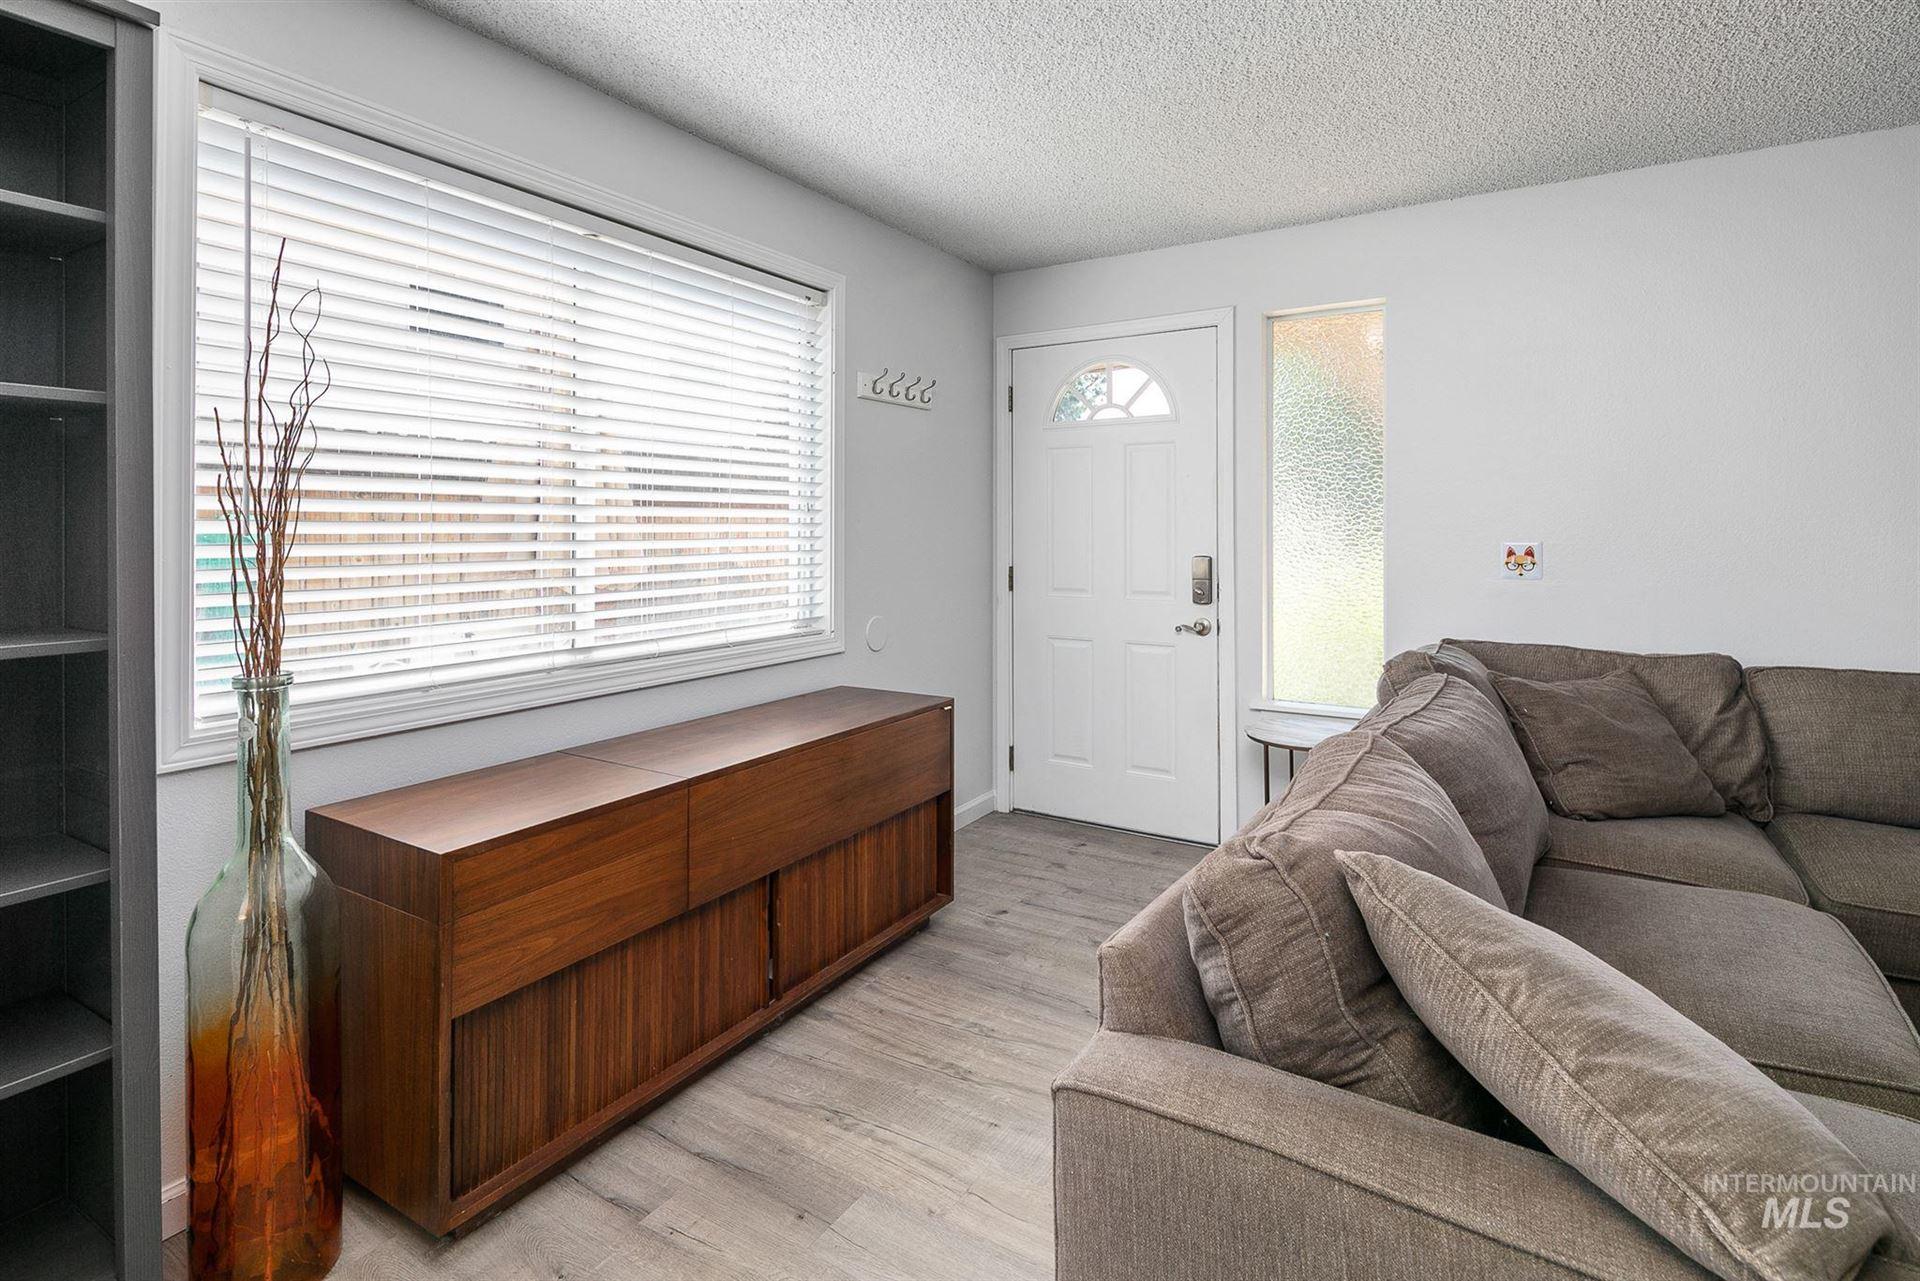 Photo of 2122 S Leadville Ave, Boise, ID 83706 (MLS # 98776279)